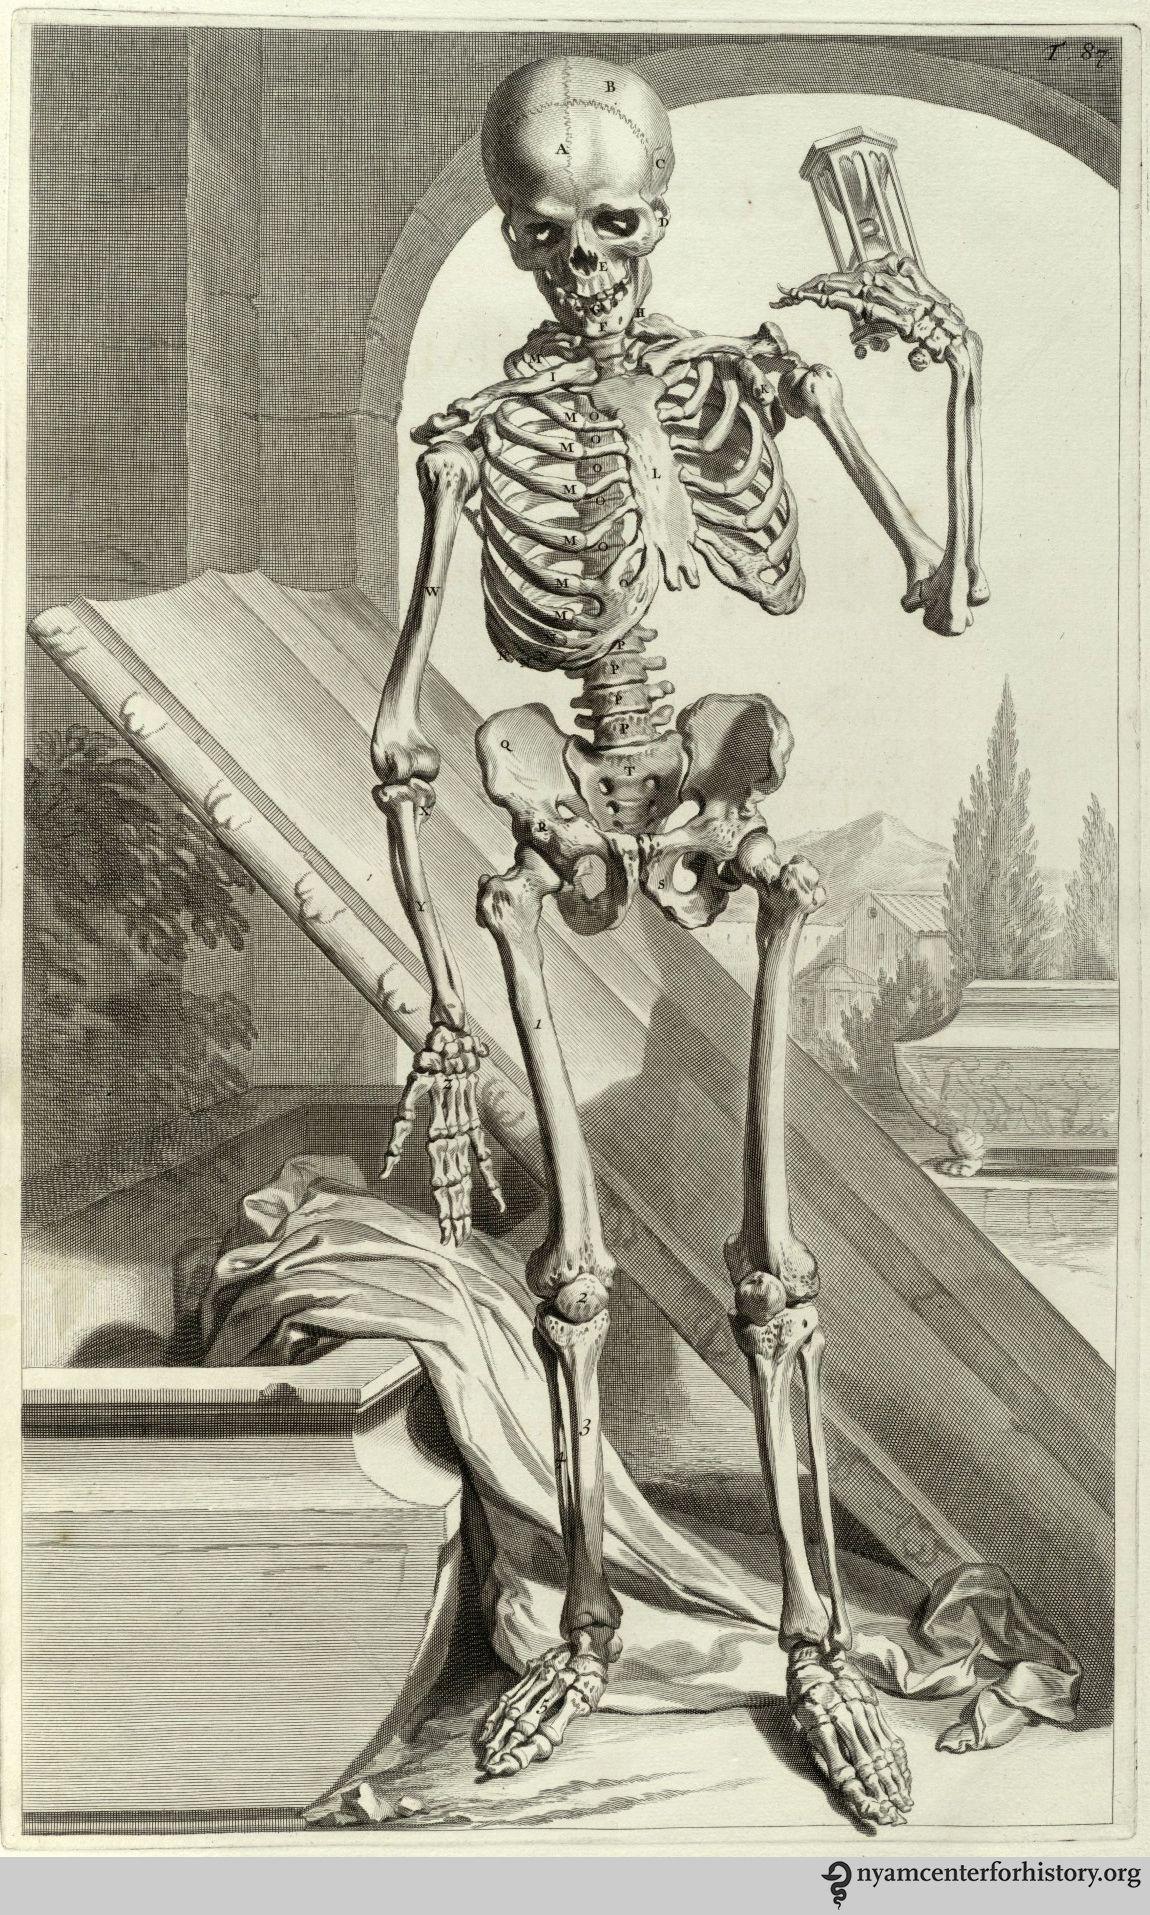 Godefridus Govert Bidloo (1644-1713). Anatomia humani corporis ...